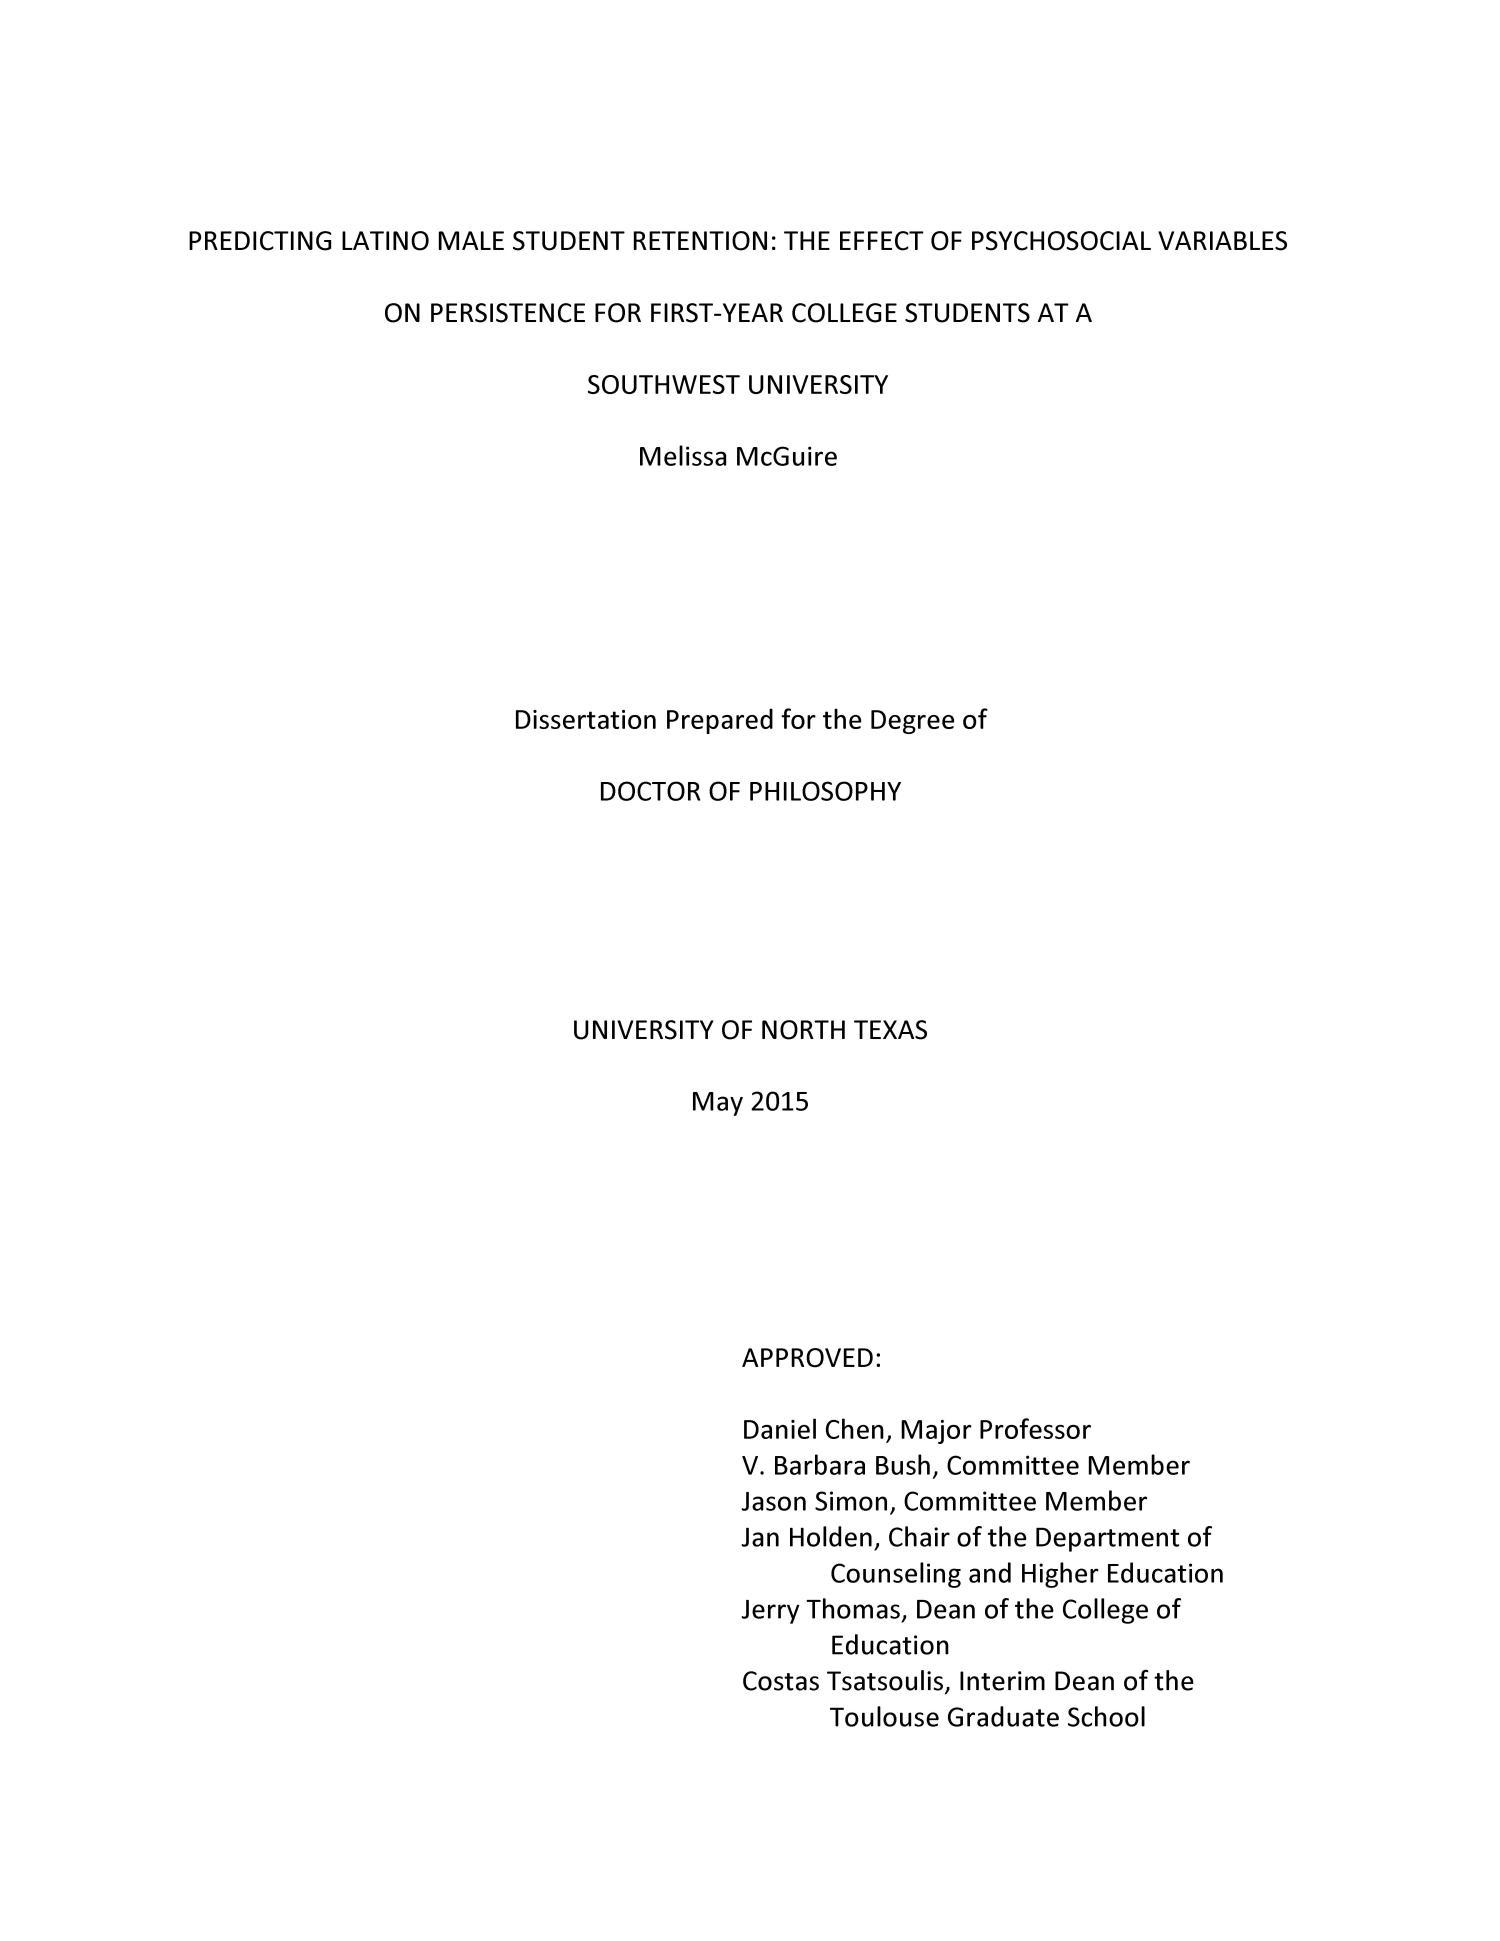 Dissertation student retention